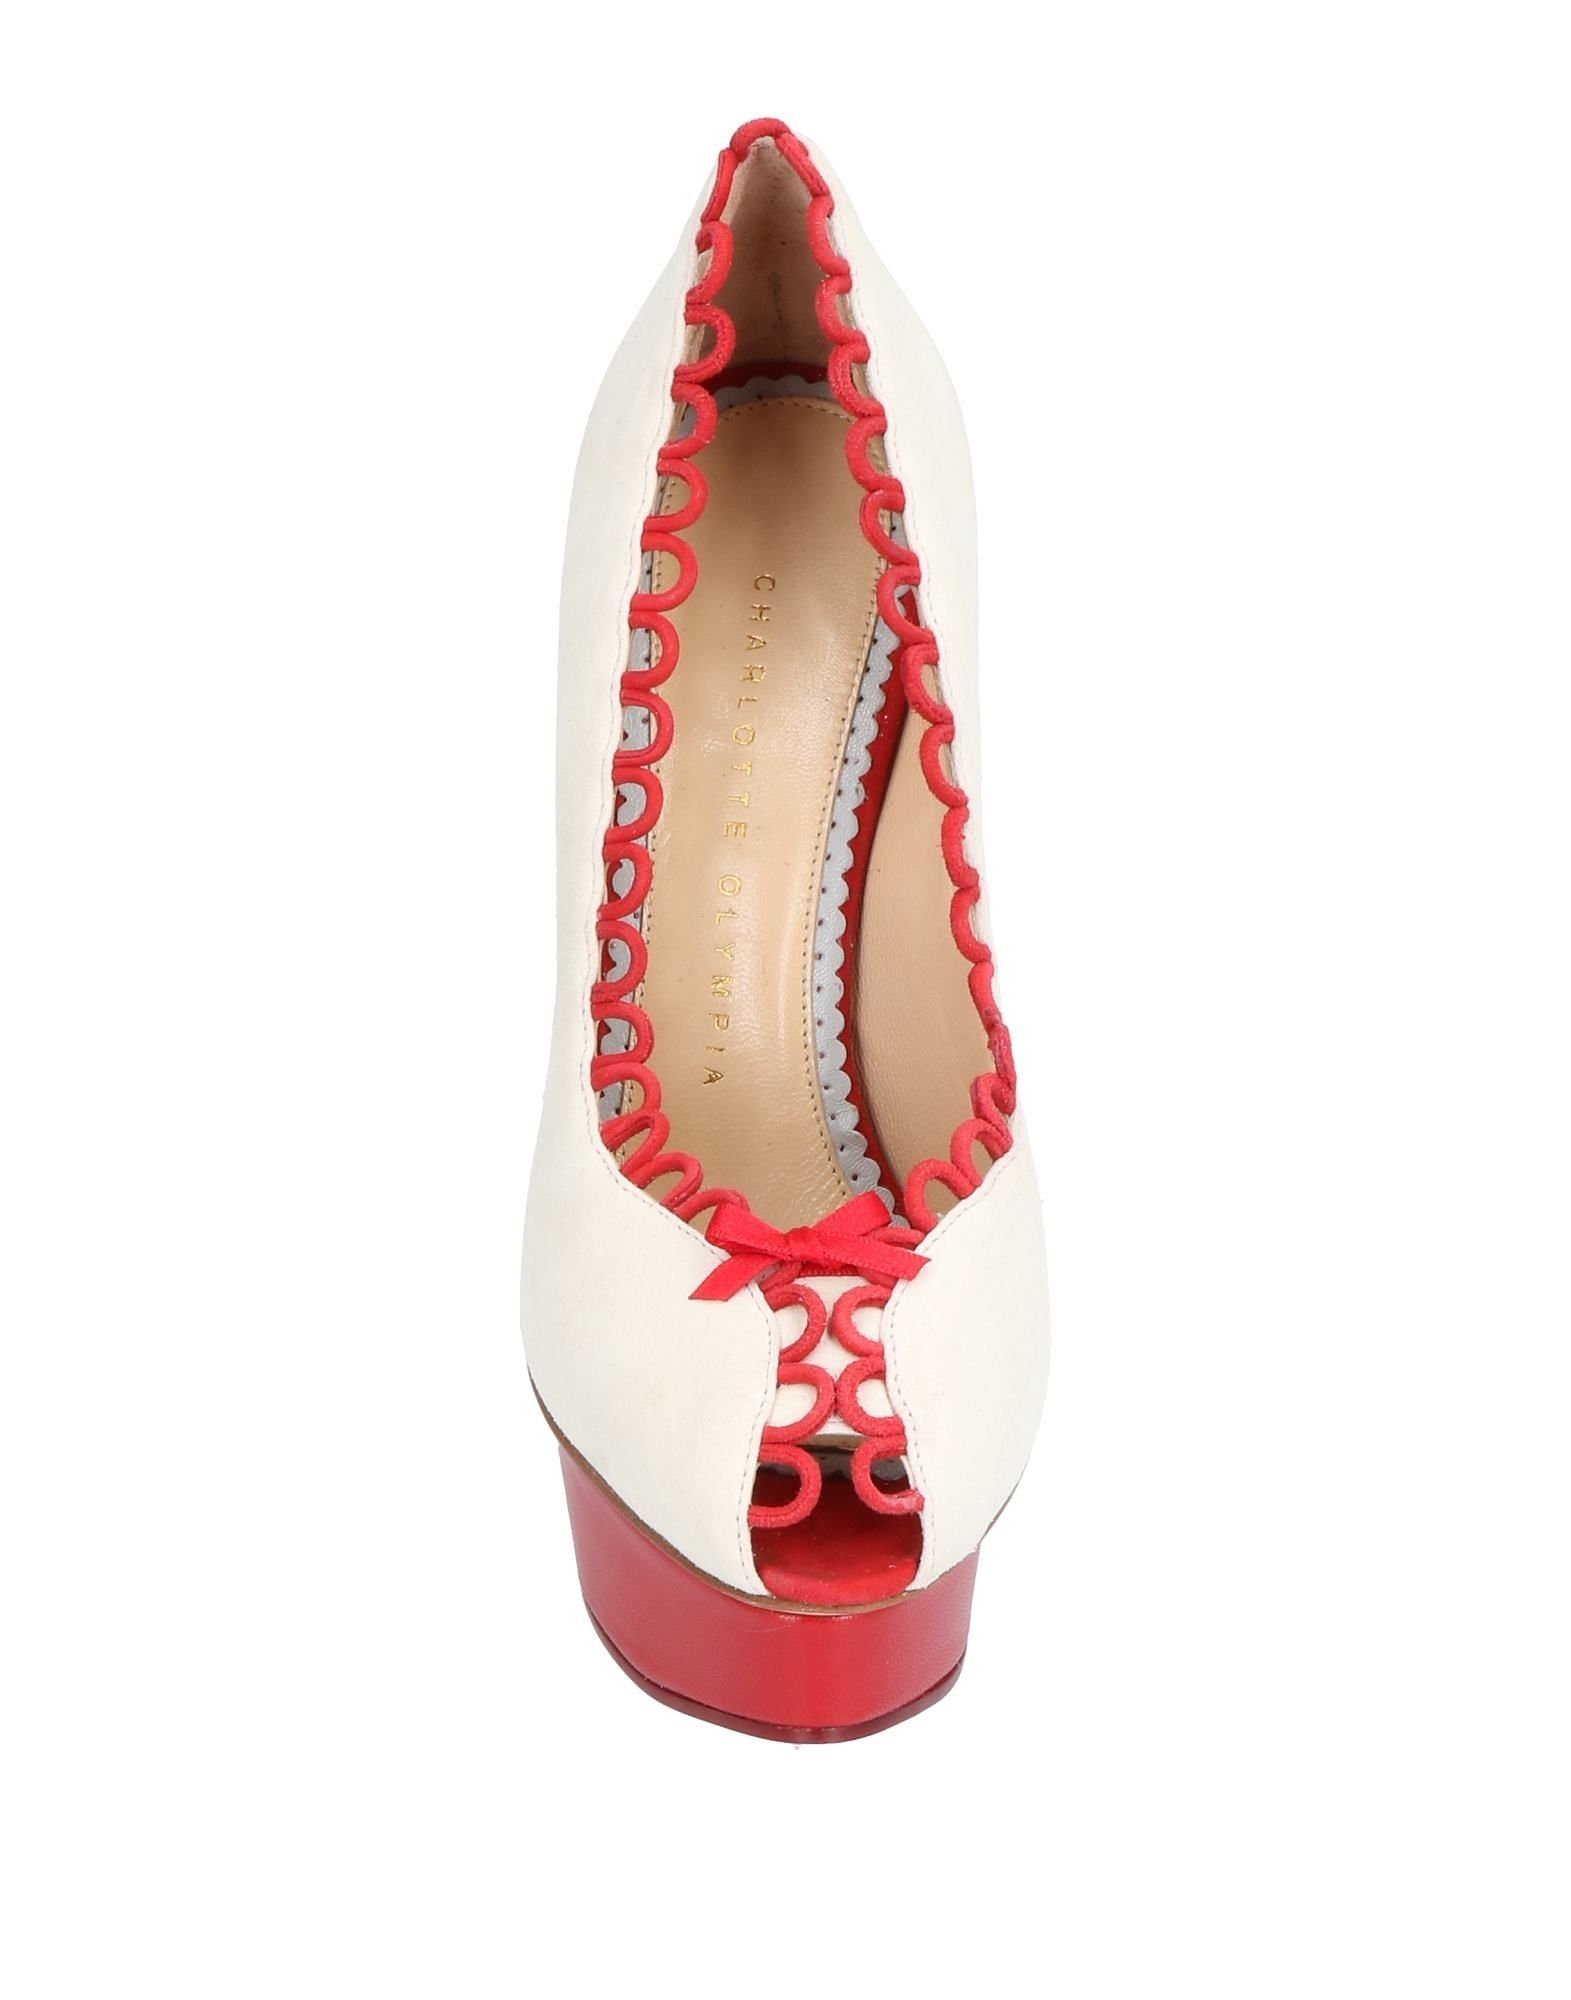 Charlotte Olympia Pumps aussehende Damen  11500063OAGünstige gut aussehende Pumps Schuhe 0be29f